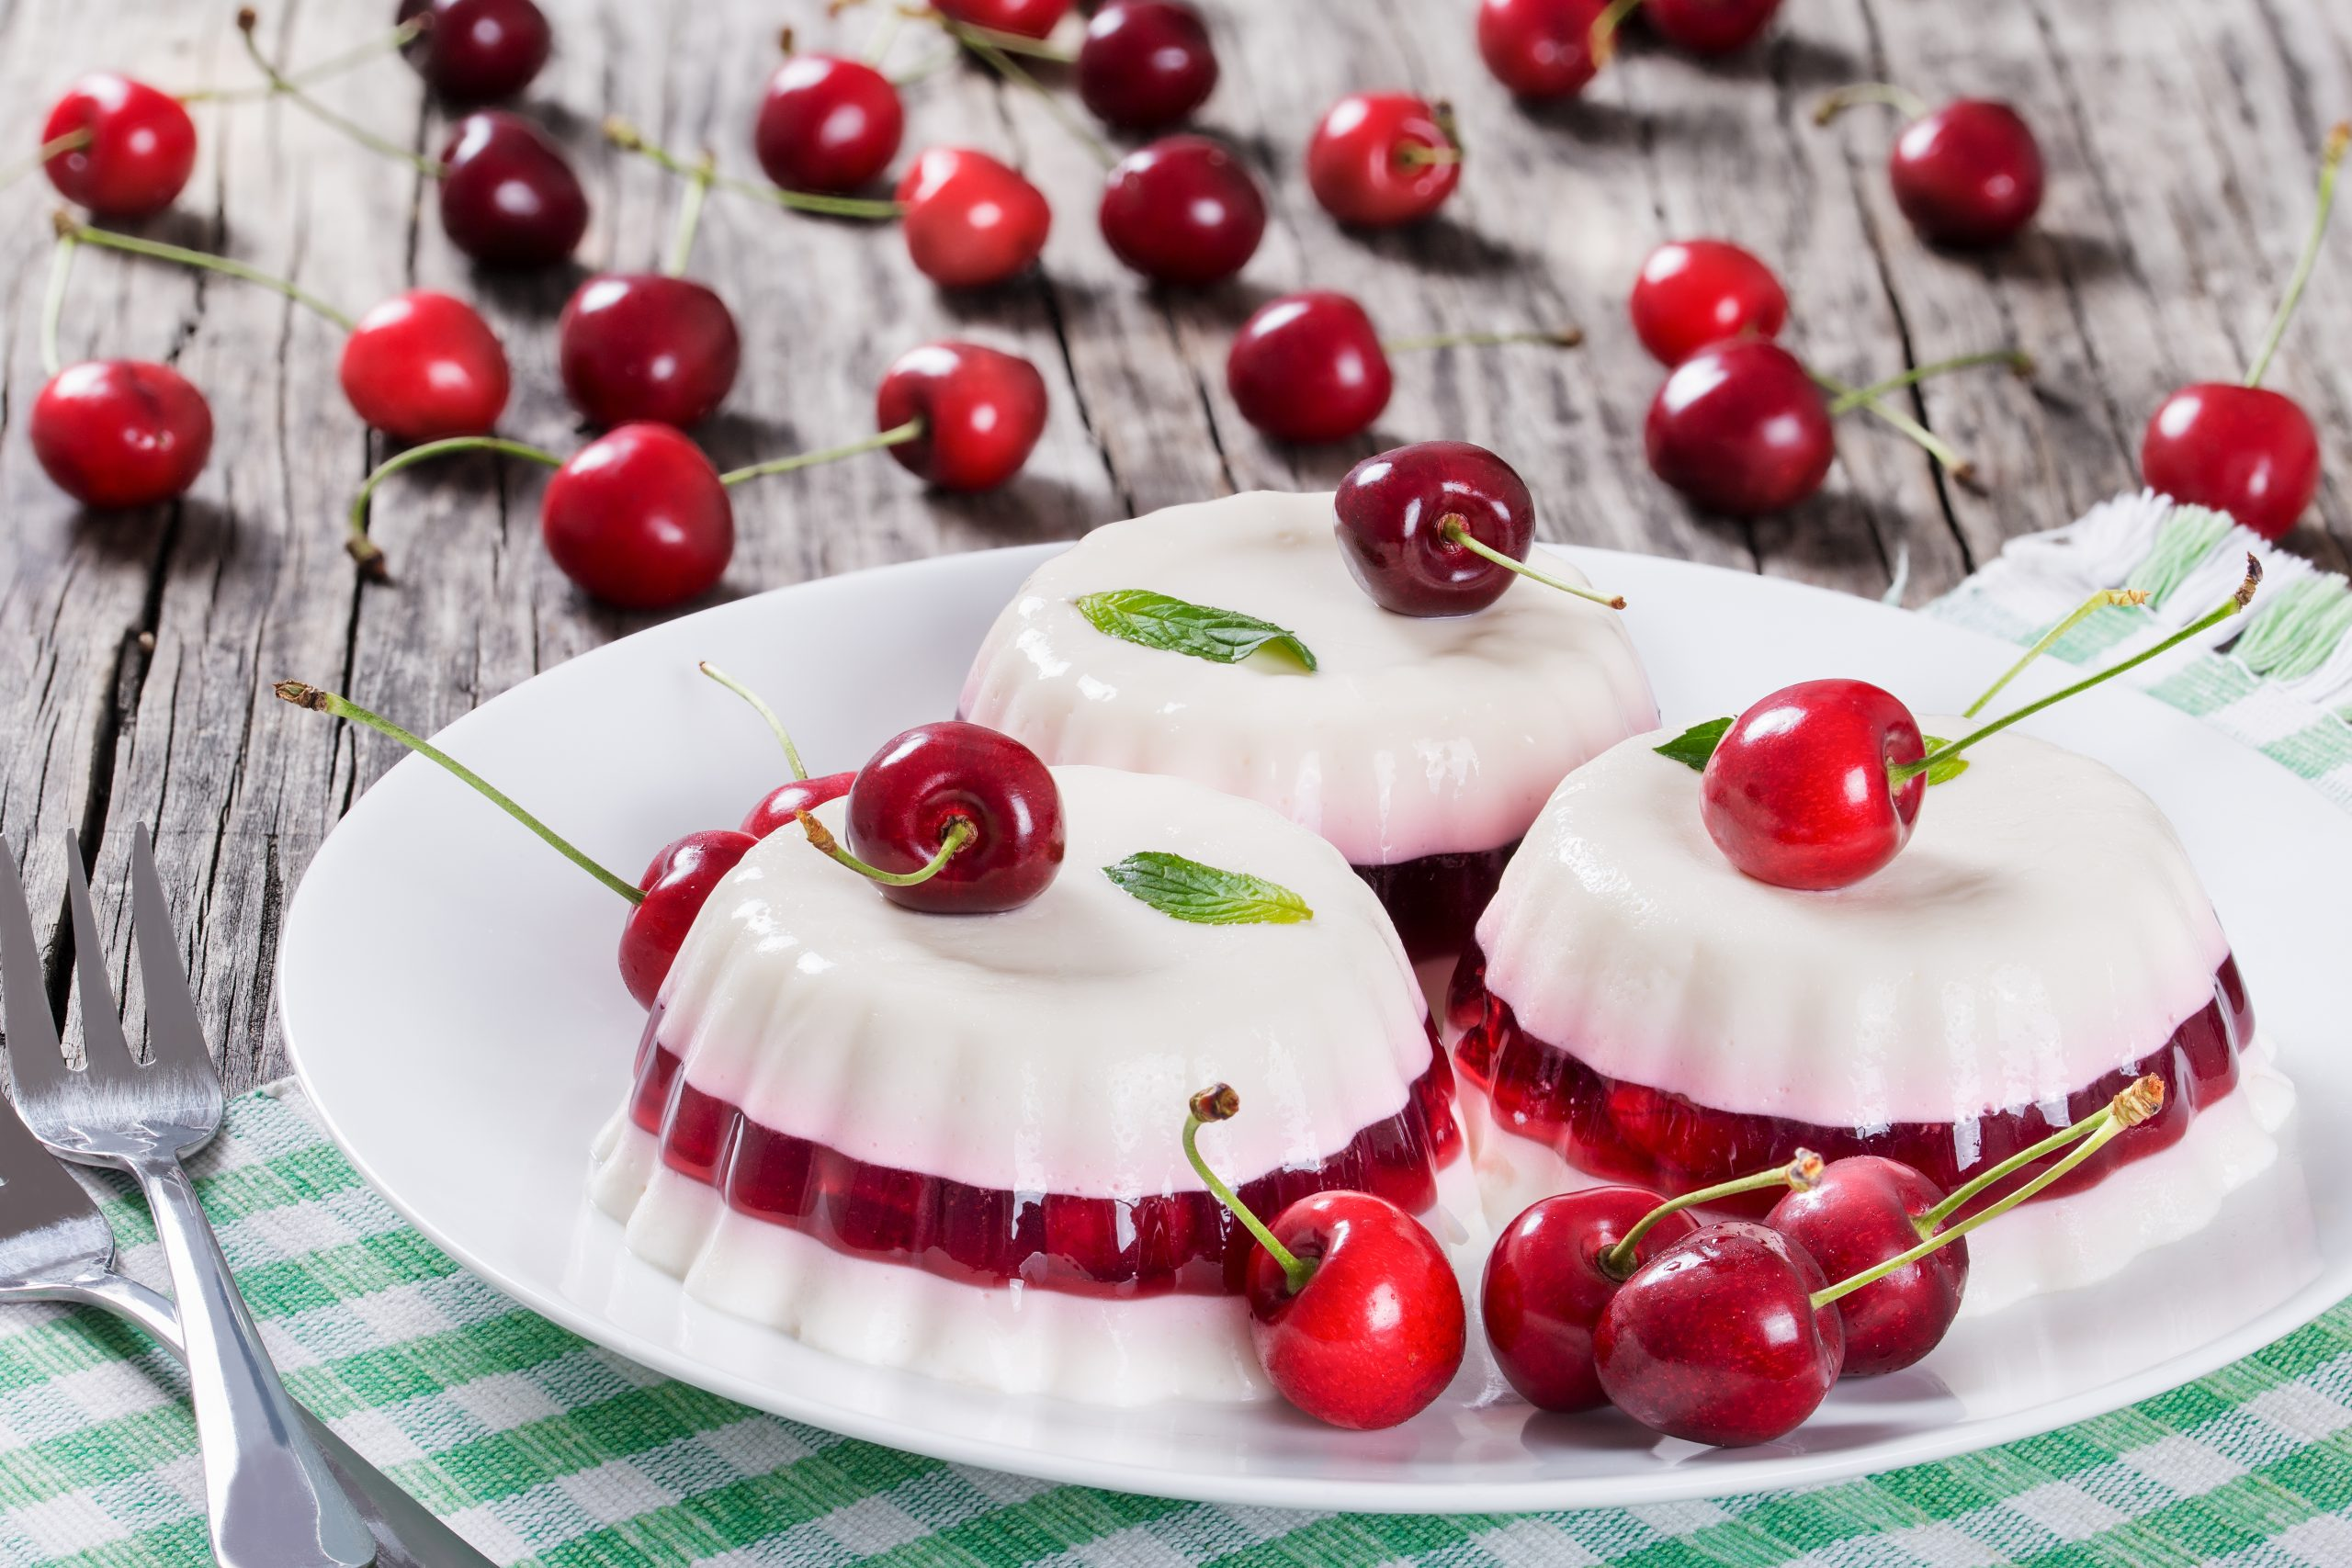 Scopri i dolci estivi senza cottura da rifare a casa